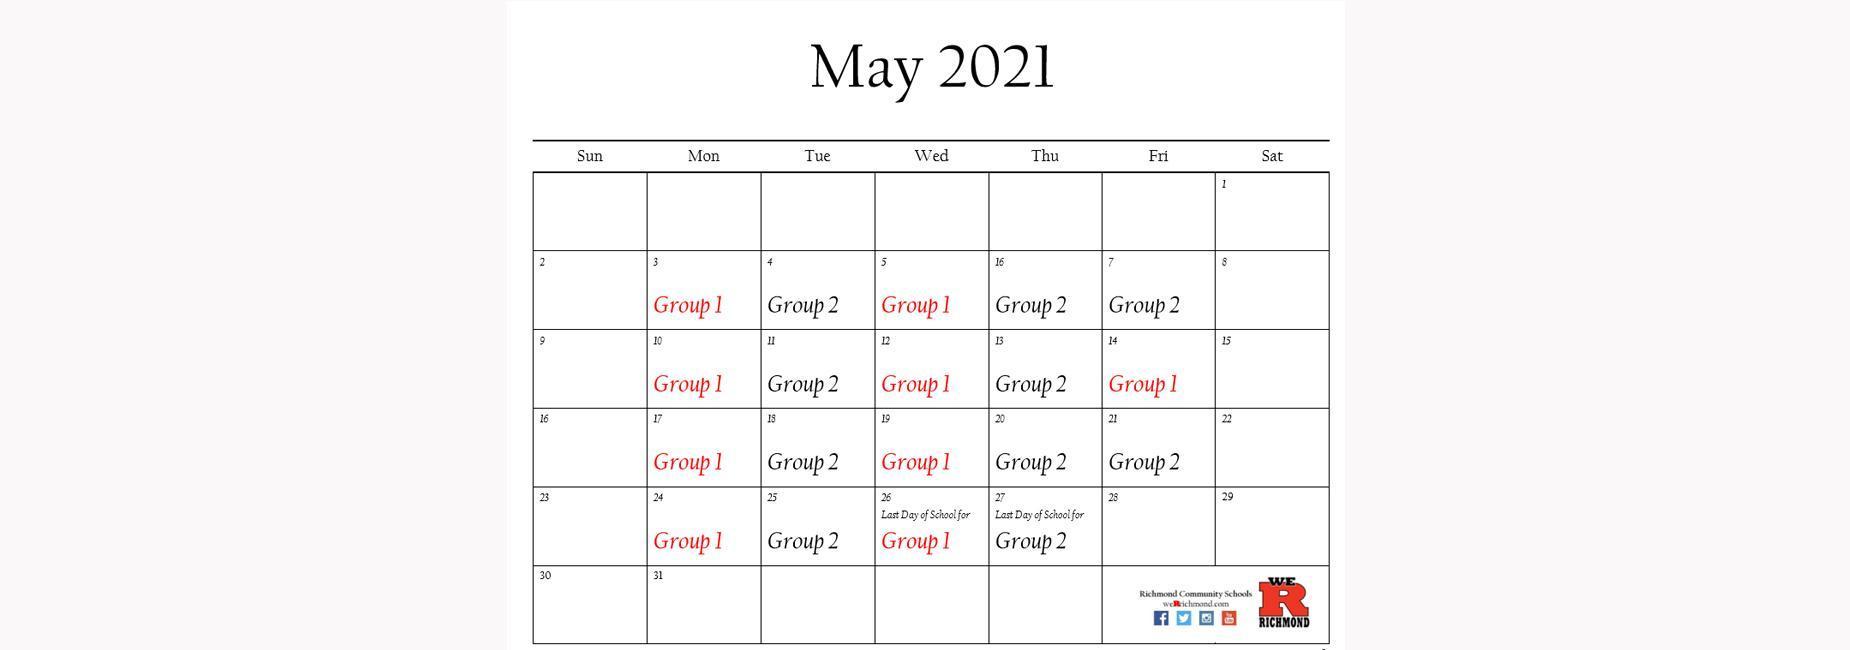 May 2021 Hybrid Calendar